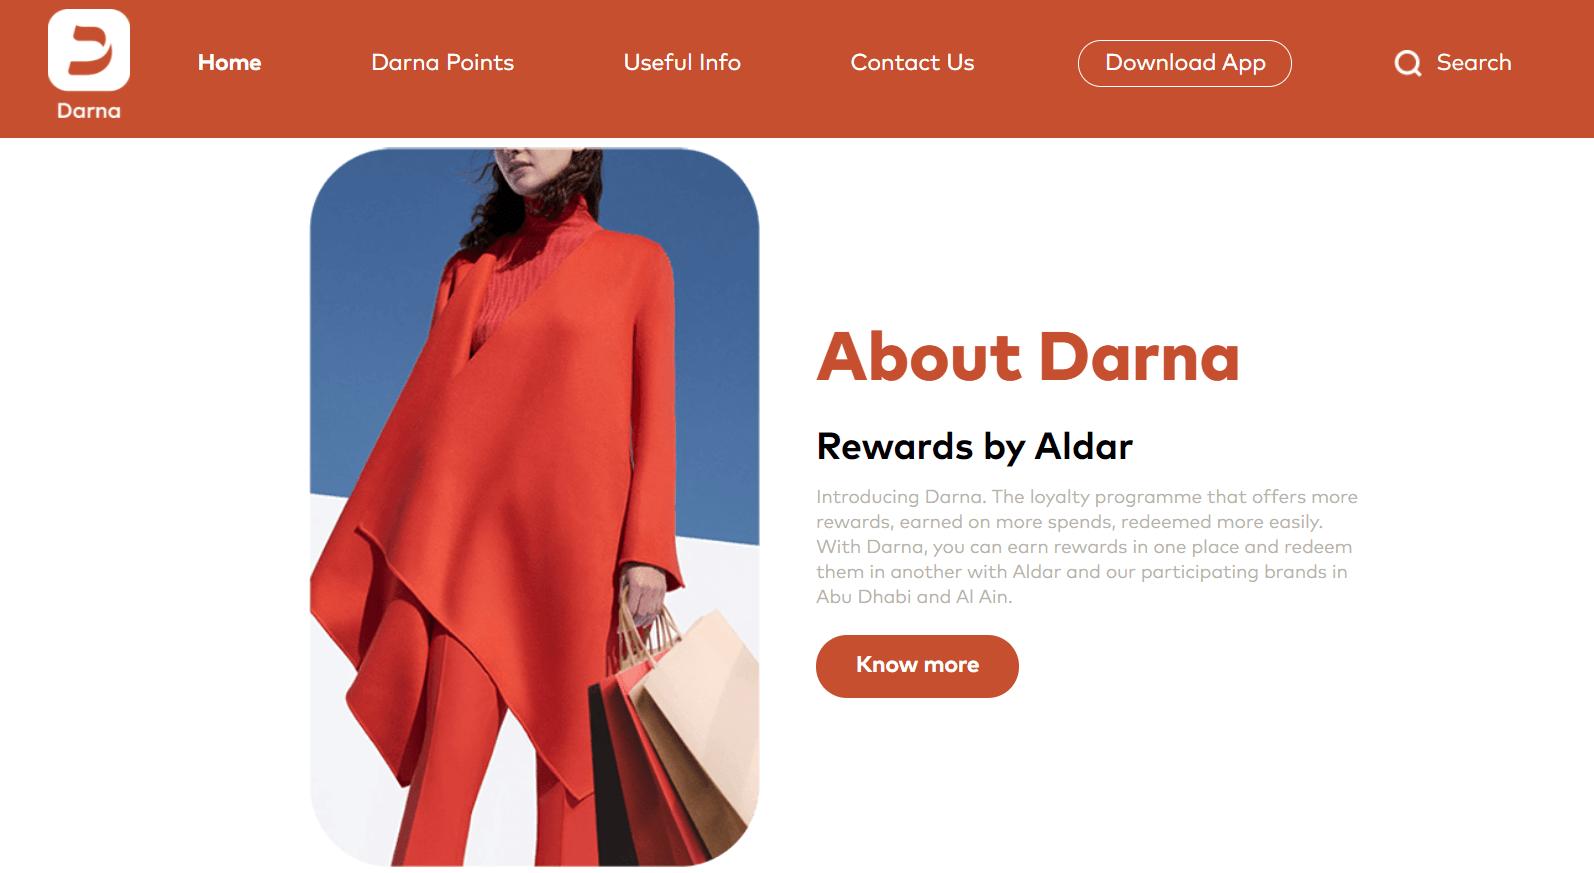 The main page of the Darna rewards coalition loyalty program